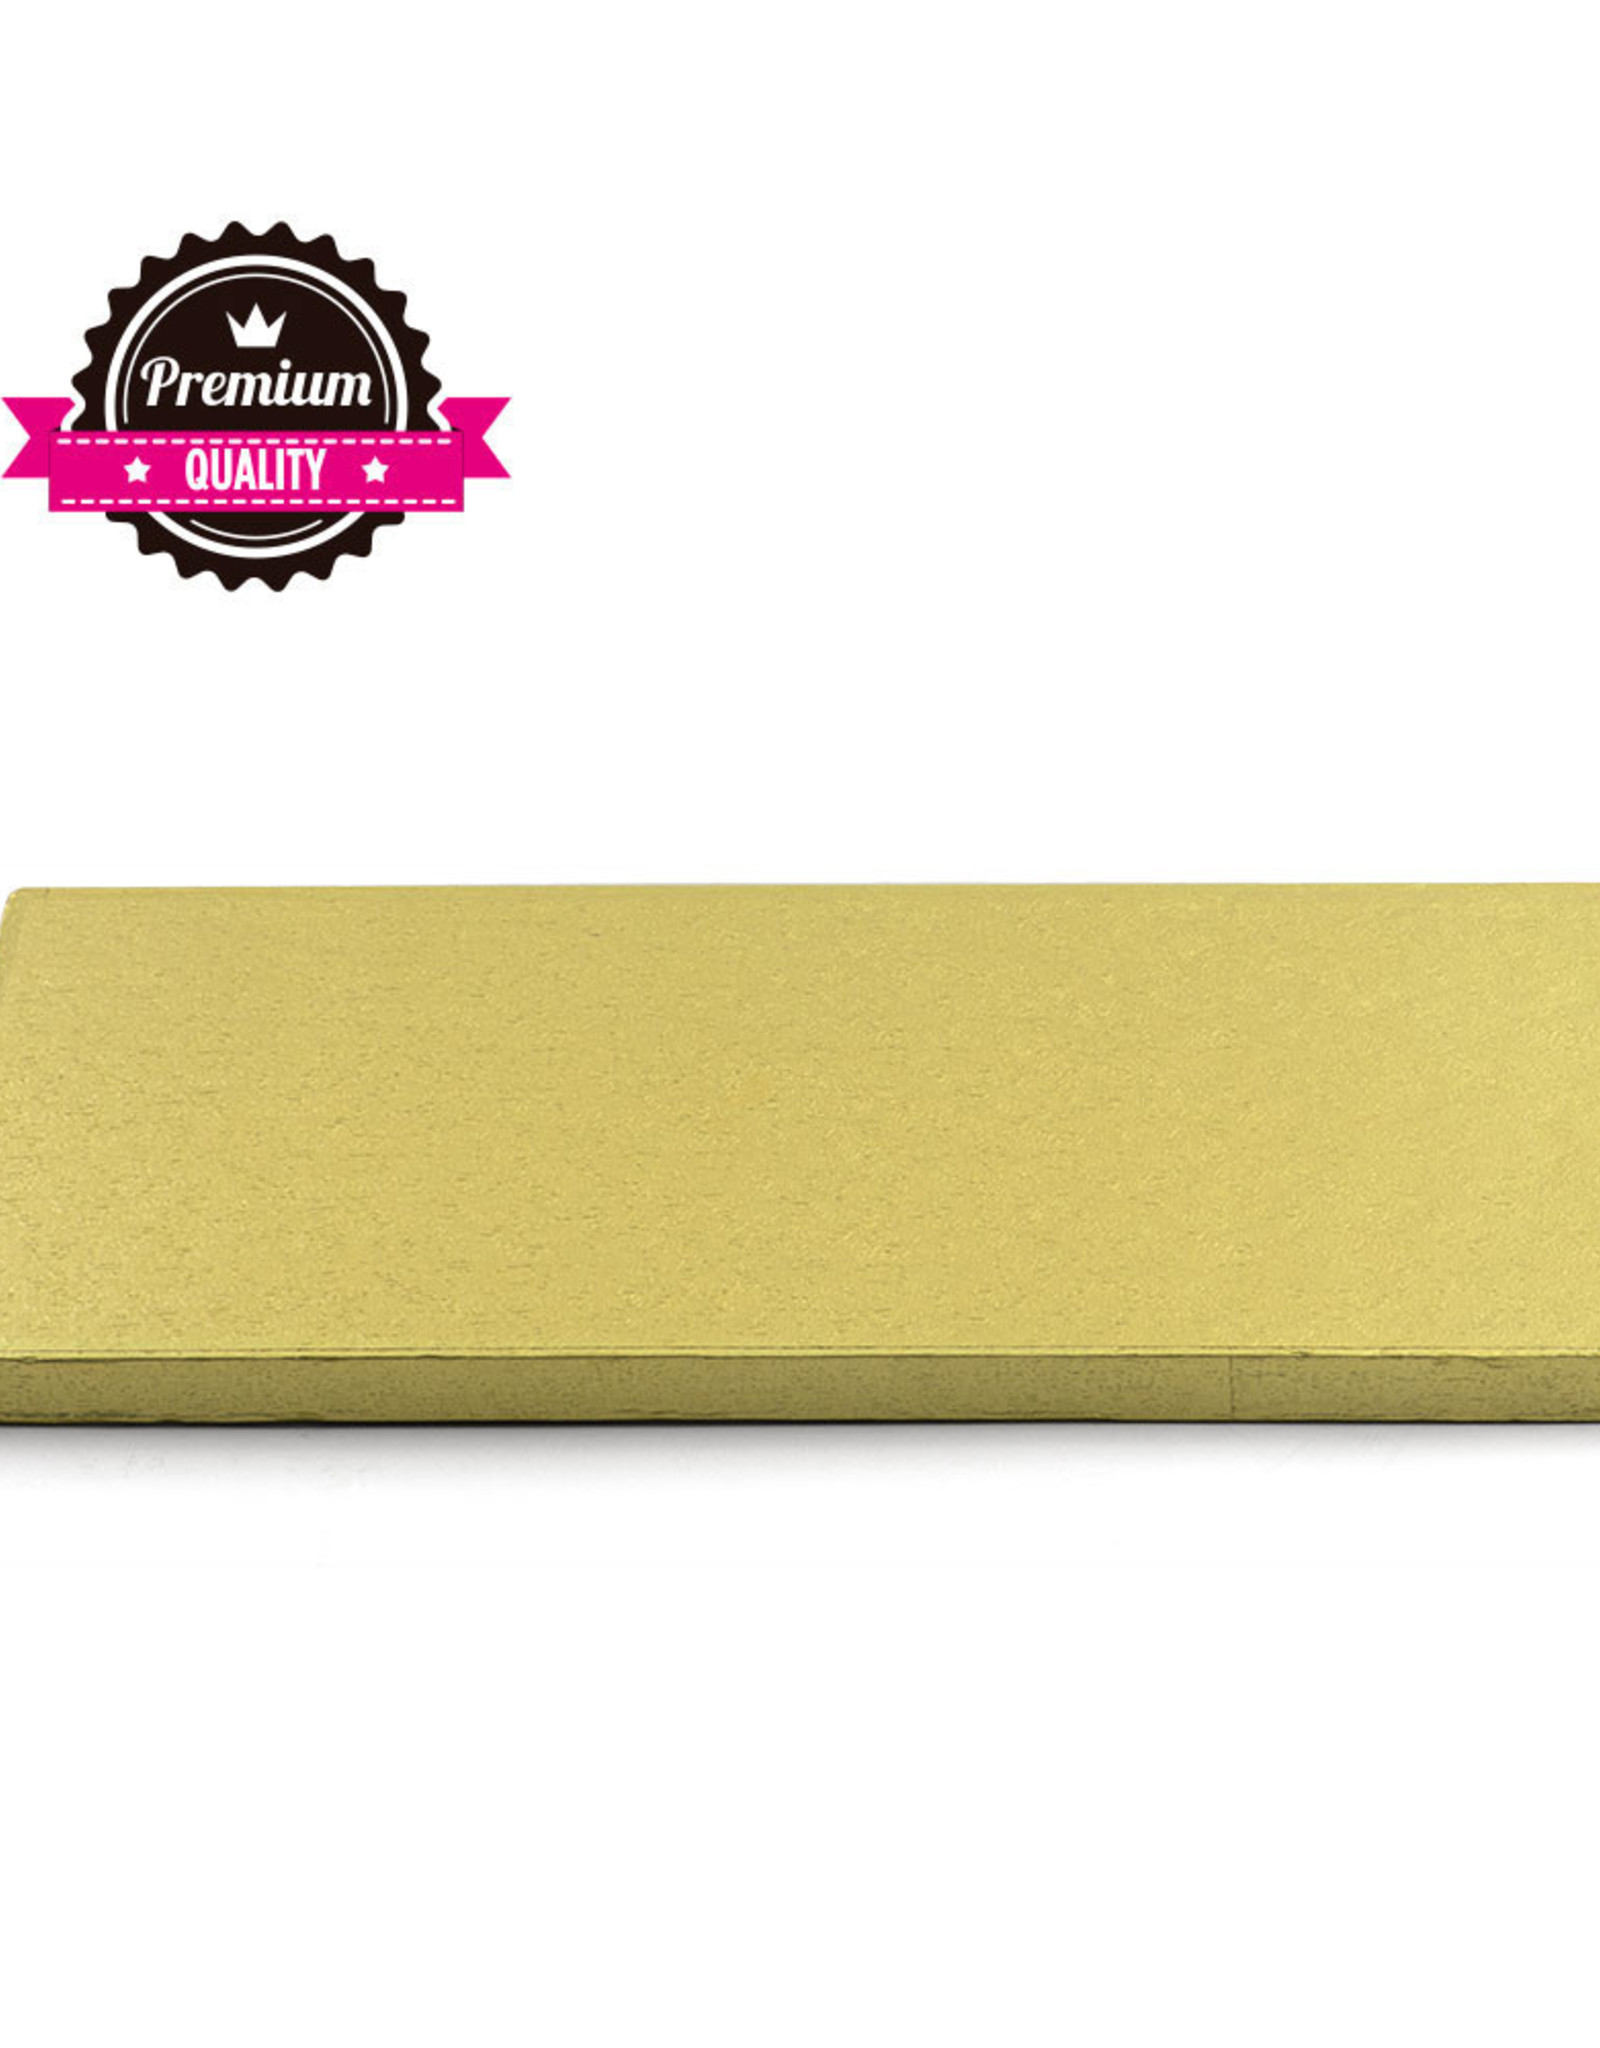 Cake Drum Rechthoek 40x30cm Gold